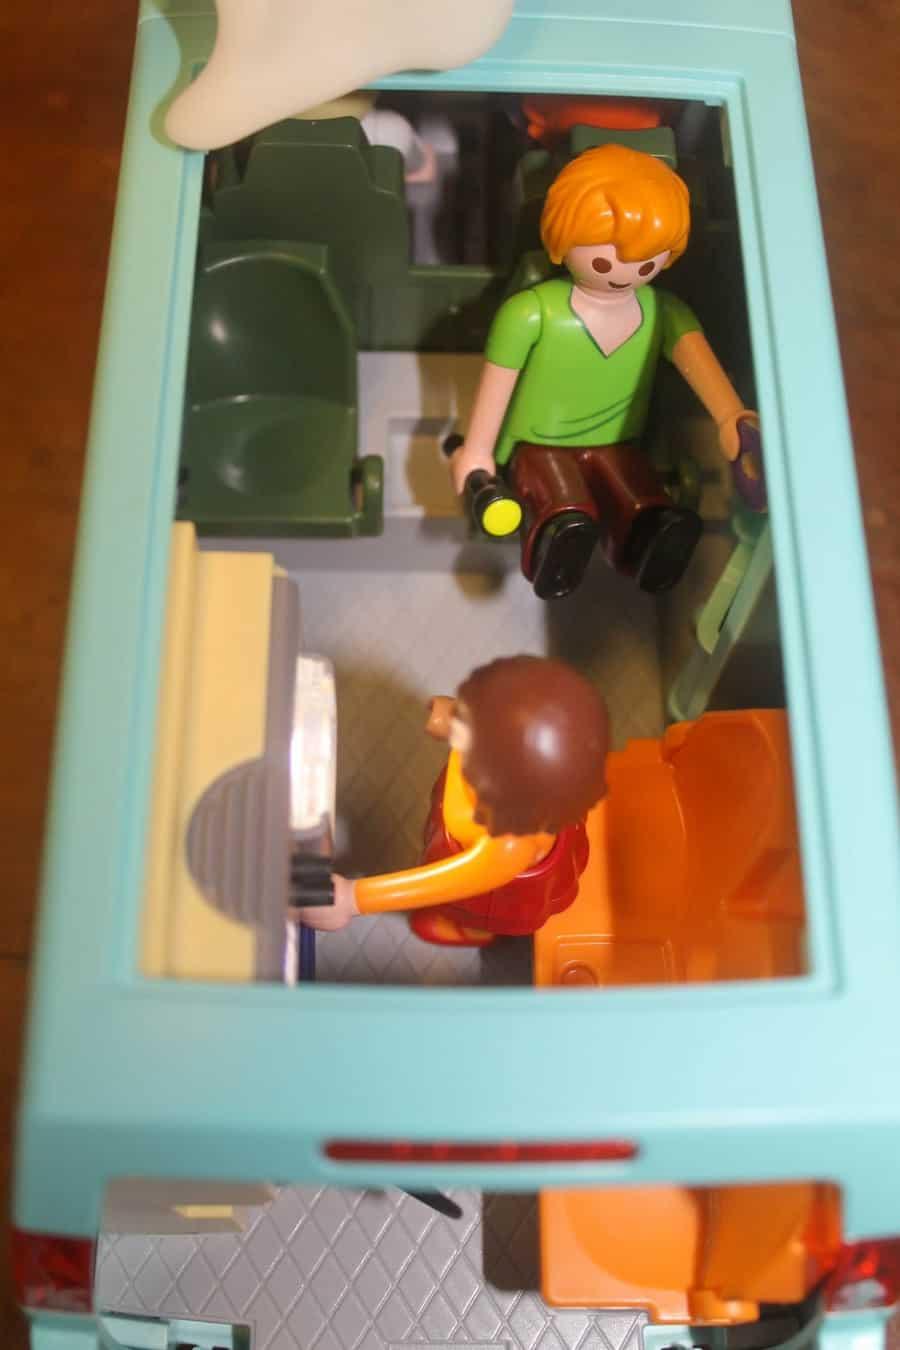 PLAYMOBILE Scooby Doo Mystery Machine 8 Jinkies! The PLAYMOBILE Scooby-Doo Mystery Machine is Totally Groovy!